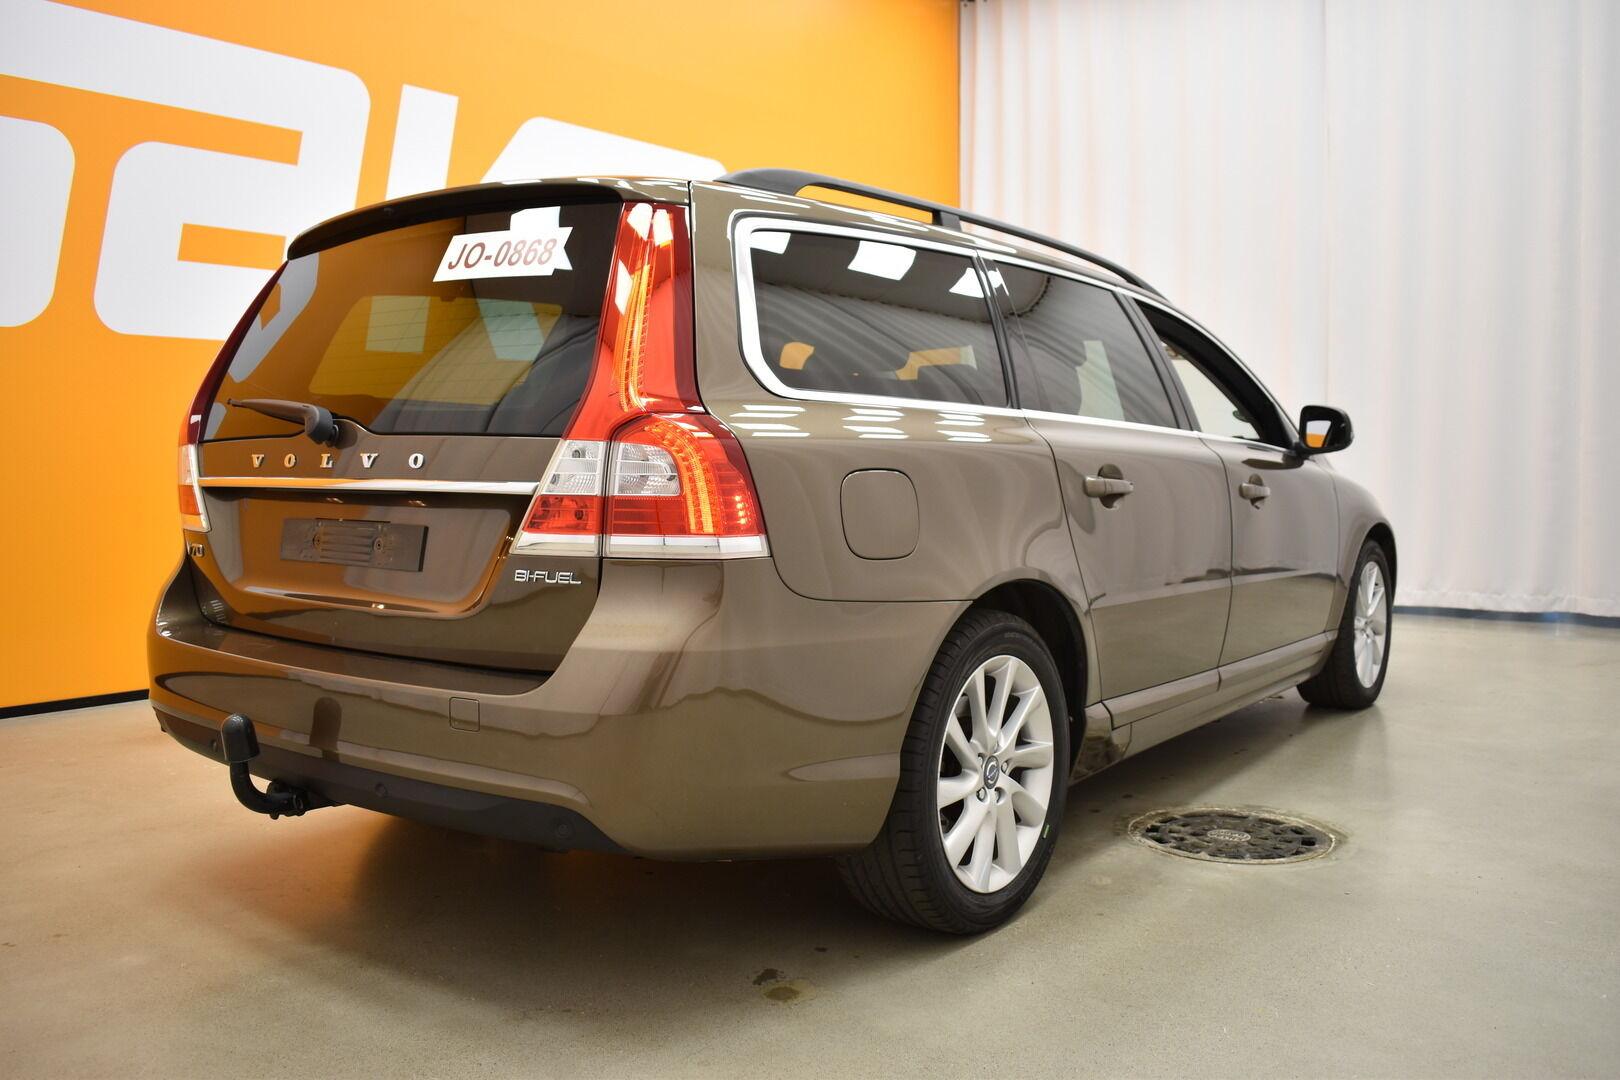 Ruskea Farmari, Volvo V70 – OUL-5351, kuva 1